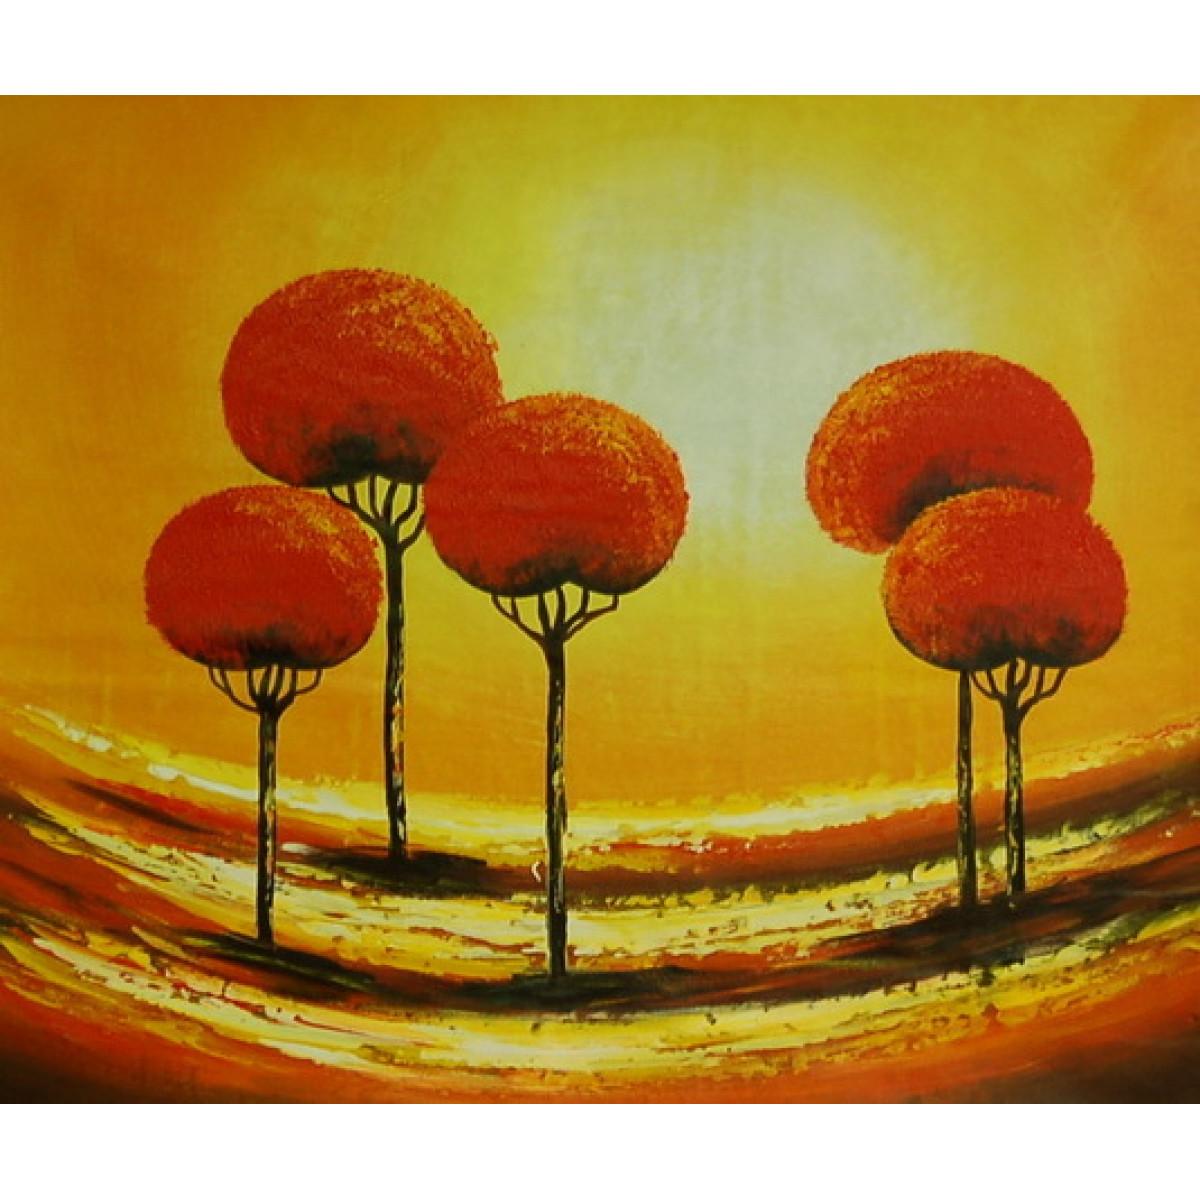 Картина Абстракция 5 деревьев, холст, масло, 50х60см